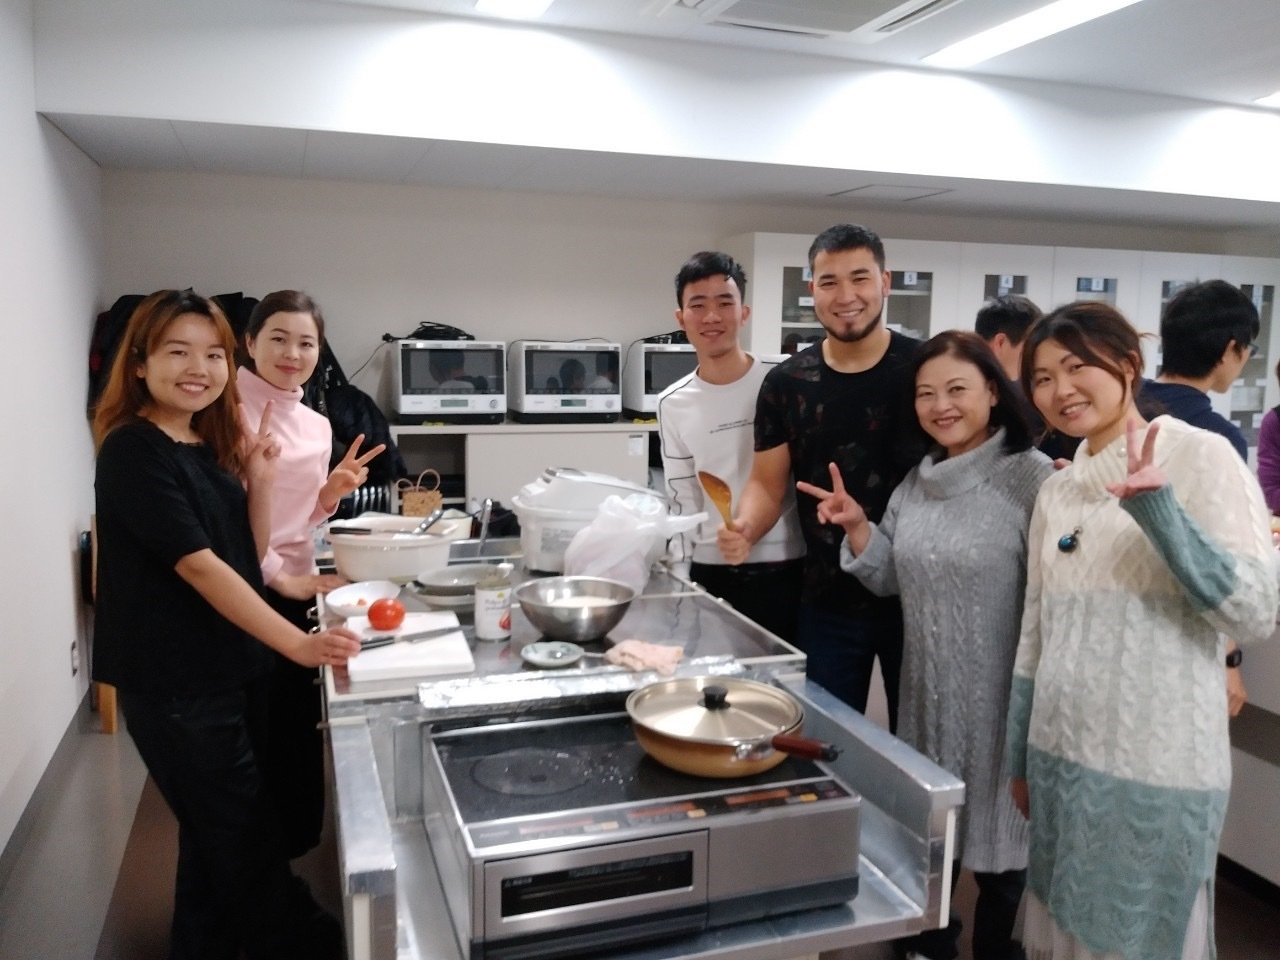 私の国の料理ー火曜夜教室_e0175020_15511212.jpg